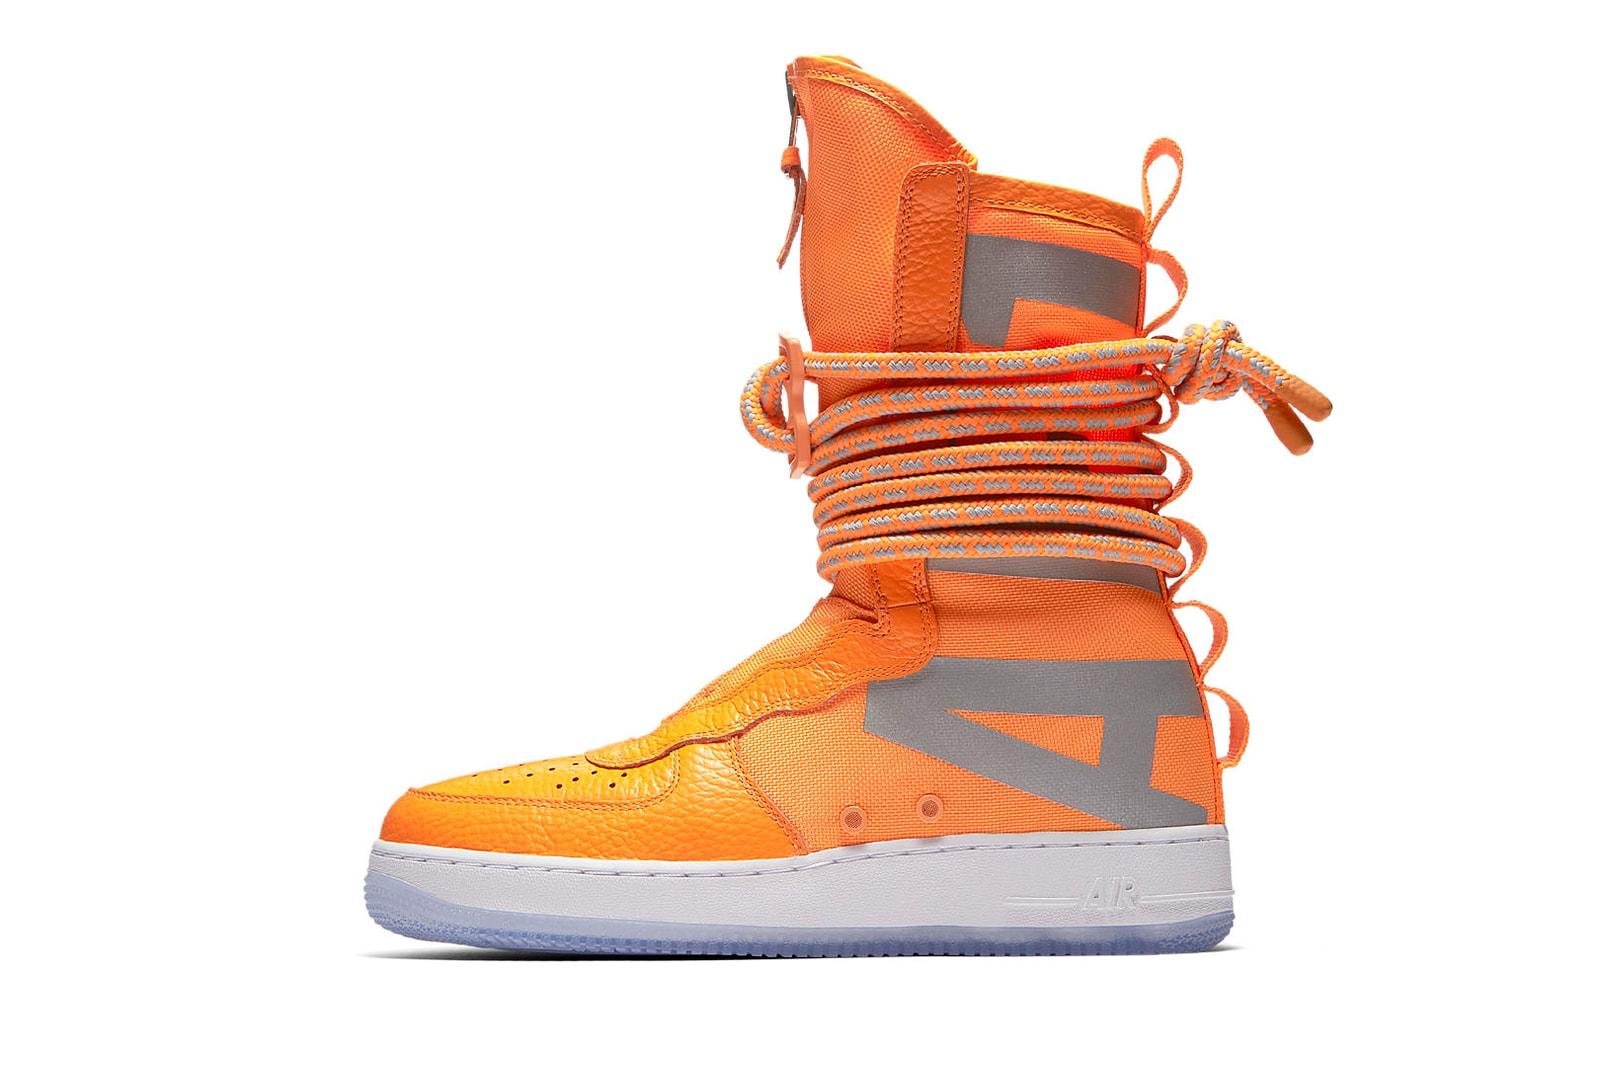 52d7a986f50e Best Sneaker Releases  November 2017 Week 1